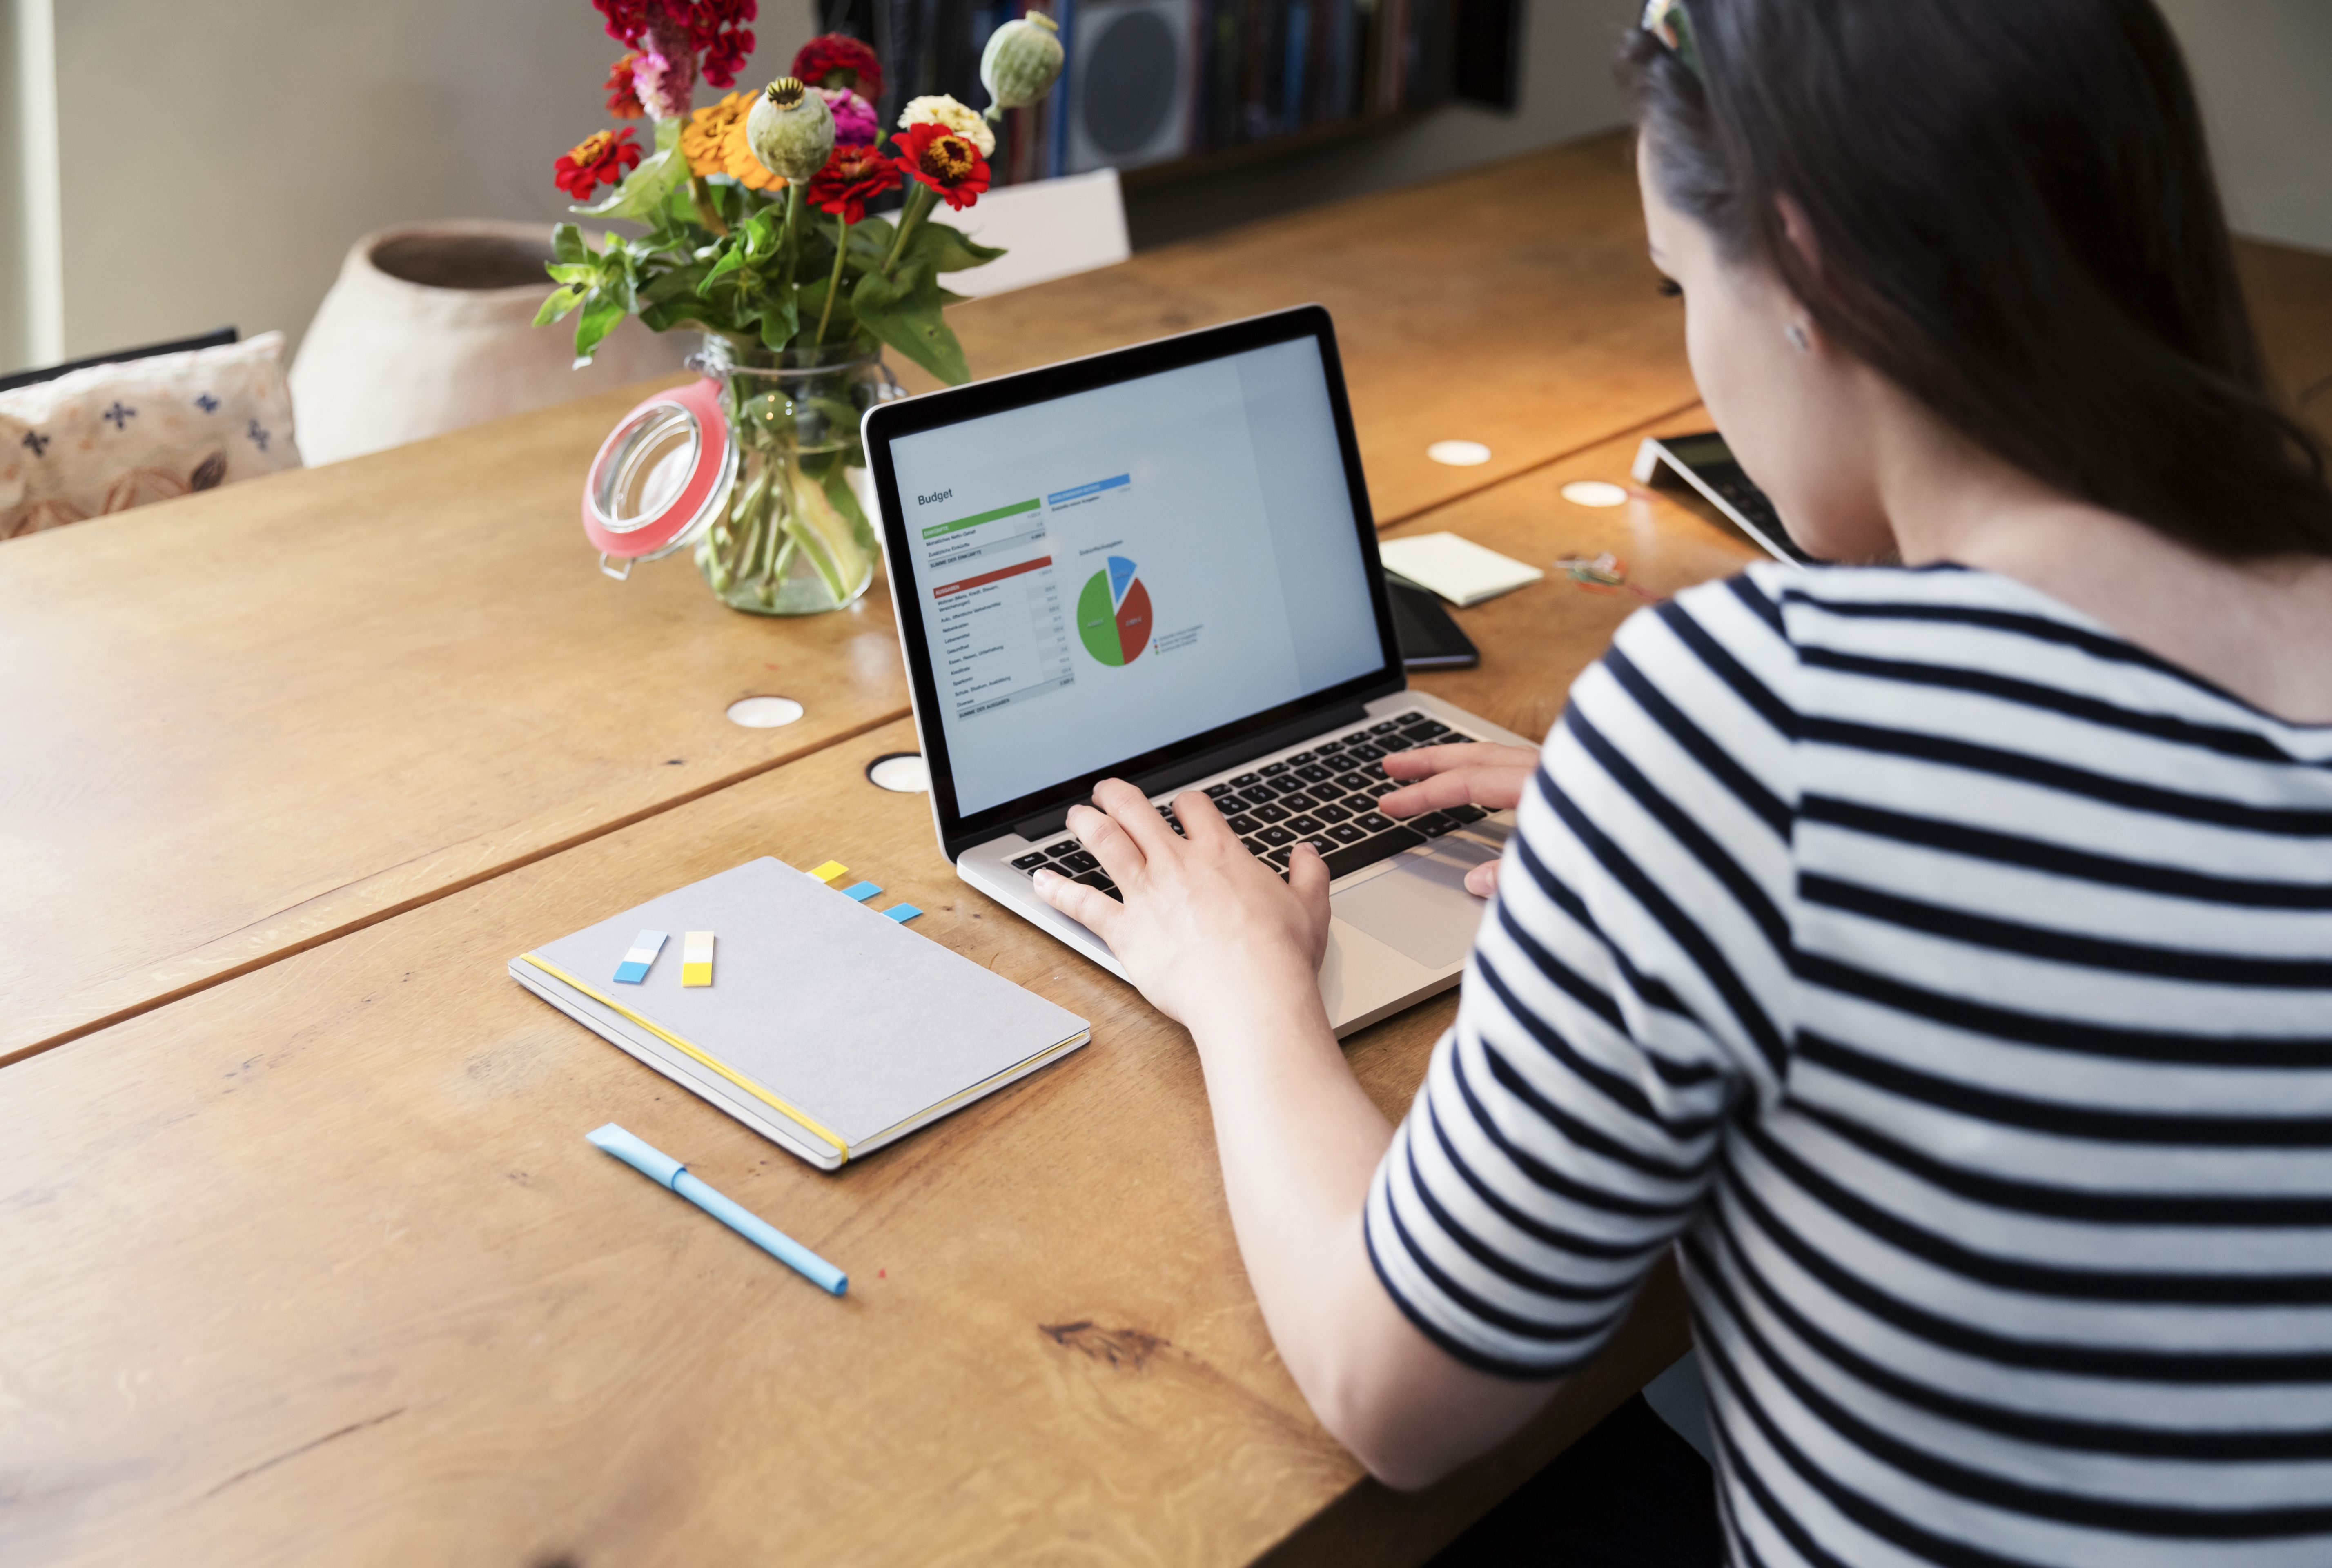 Budget Worksheet To Manage Your Savings Goals Inside Online Budget Calculator Spreadsheet